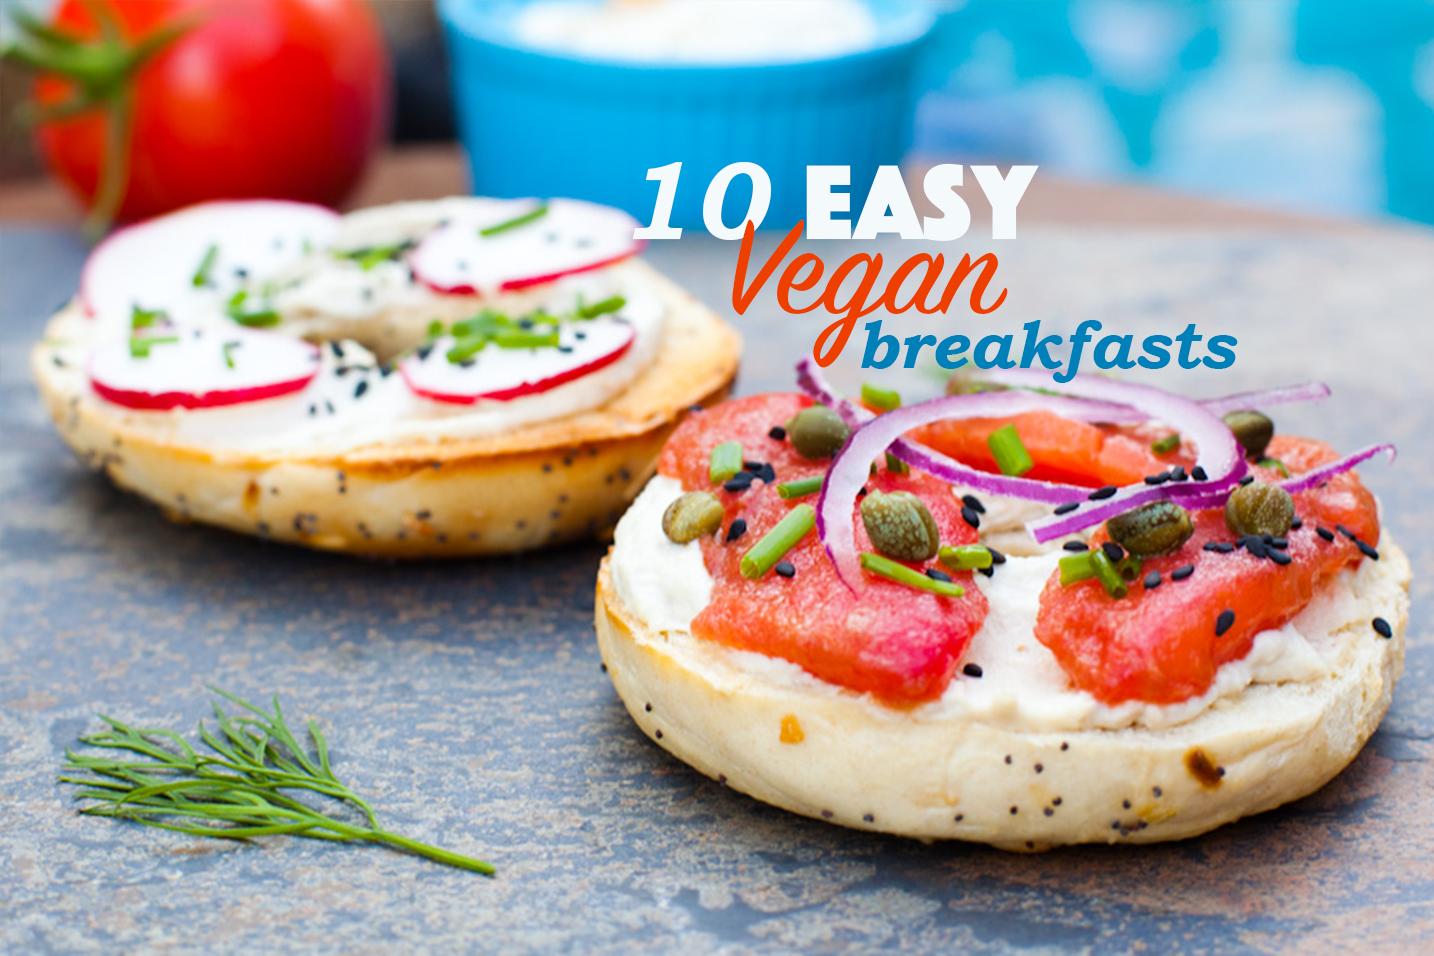 10 DELICIOUS + EASY Vegan Breakfasts that aren't avocado toast!